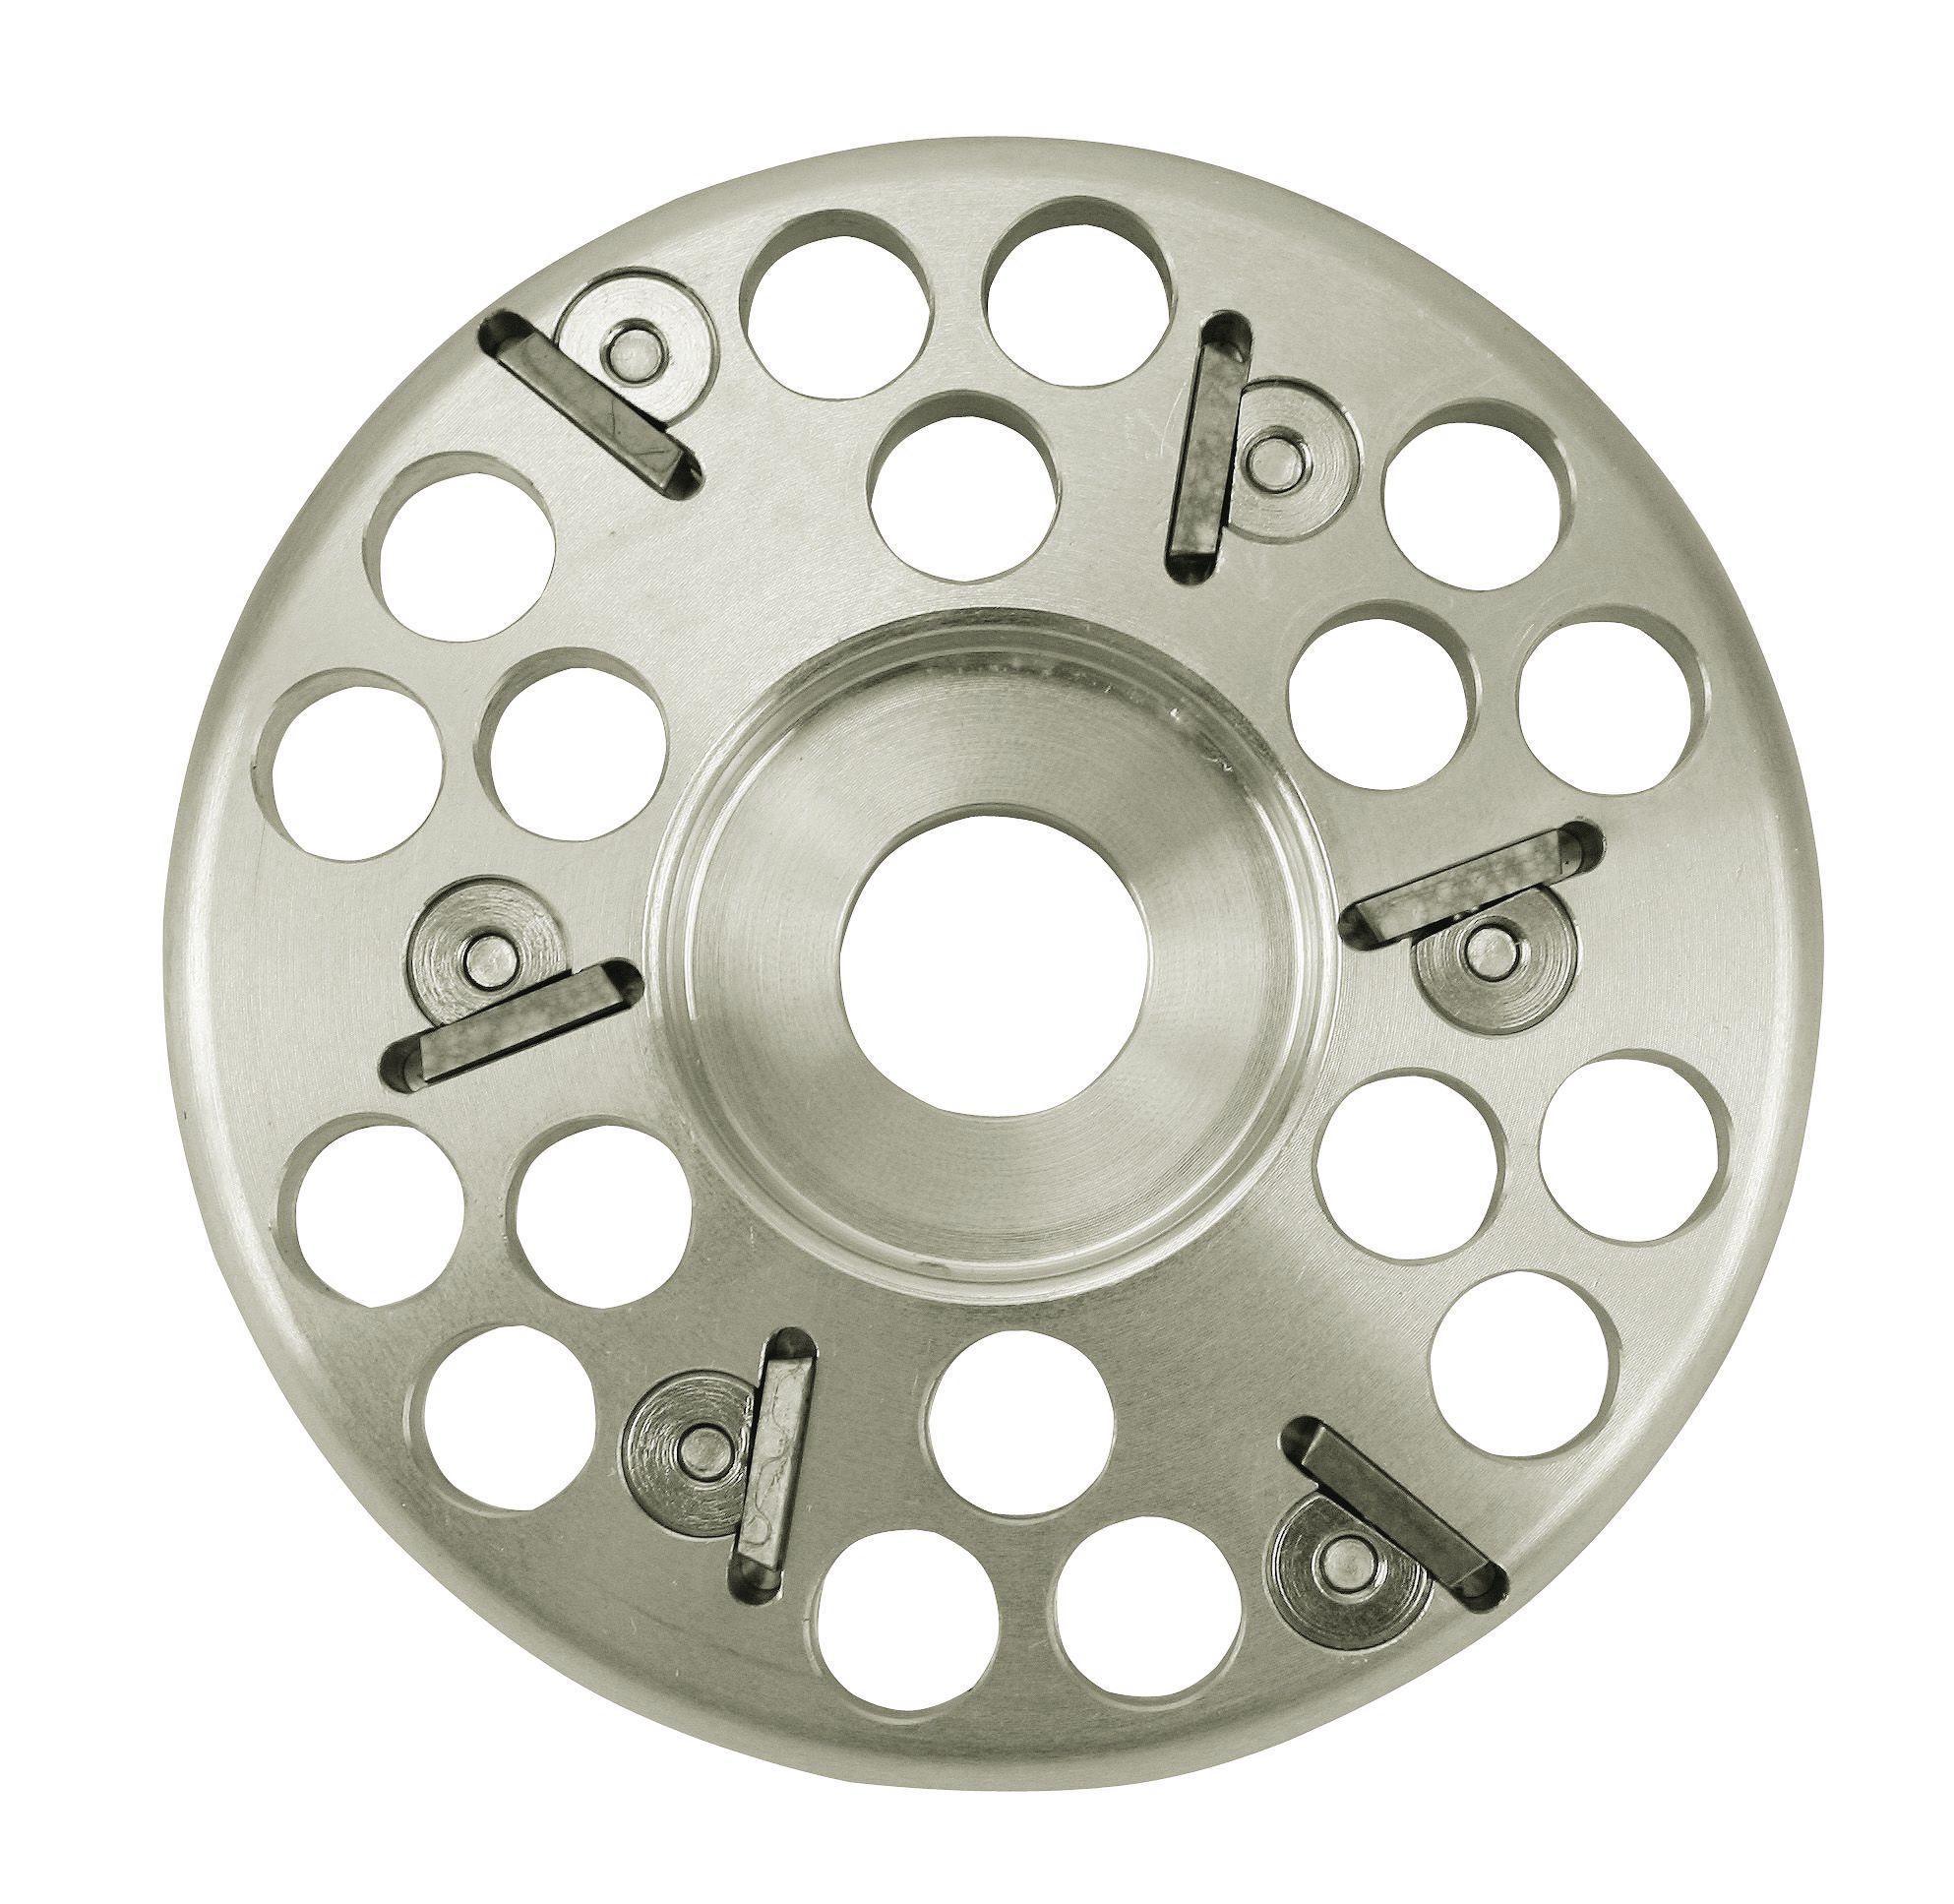 Disc abraziv Kerbl 6 Cut Ø 120 mm